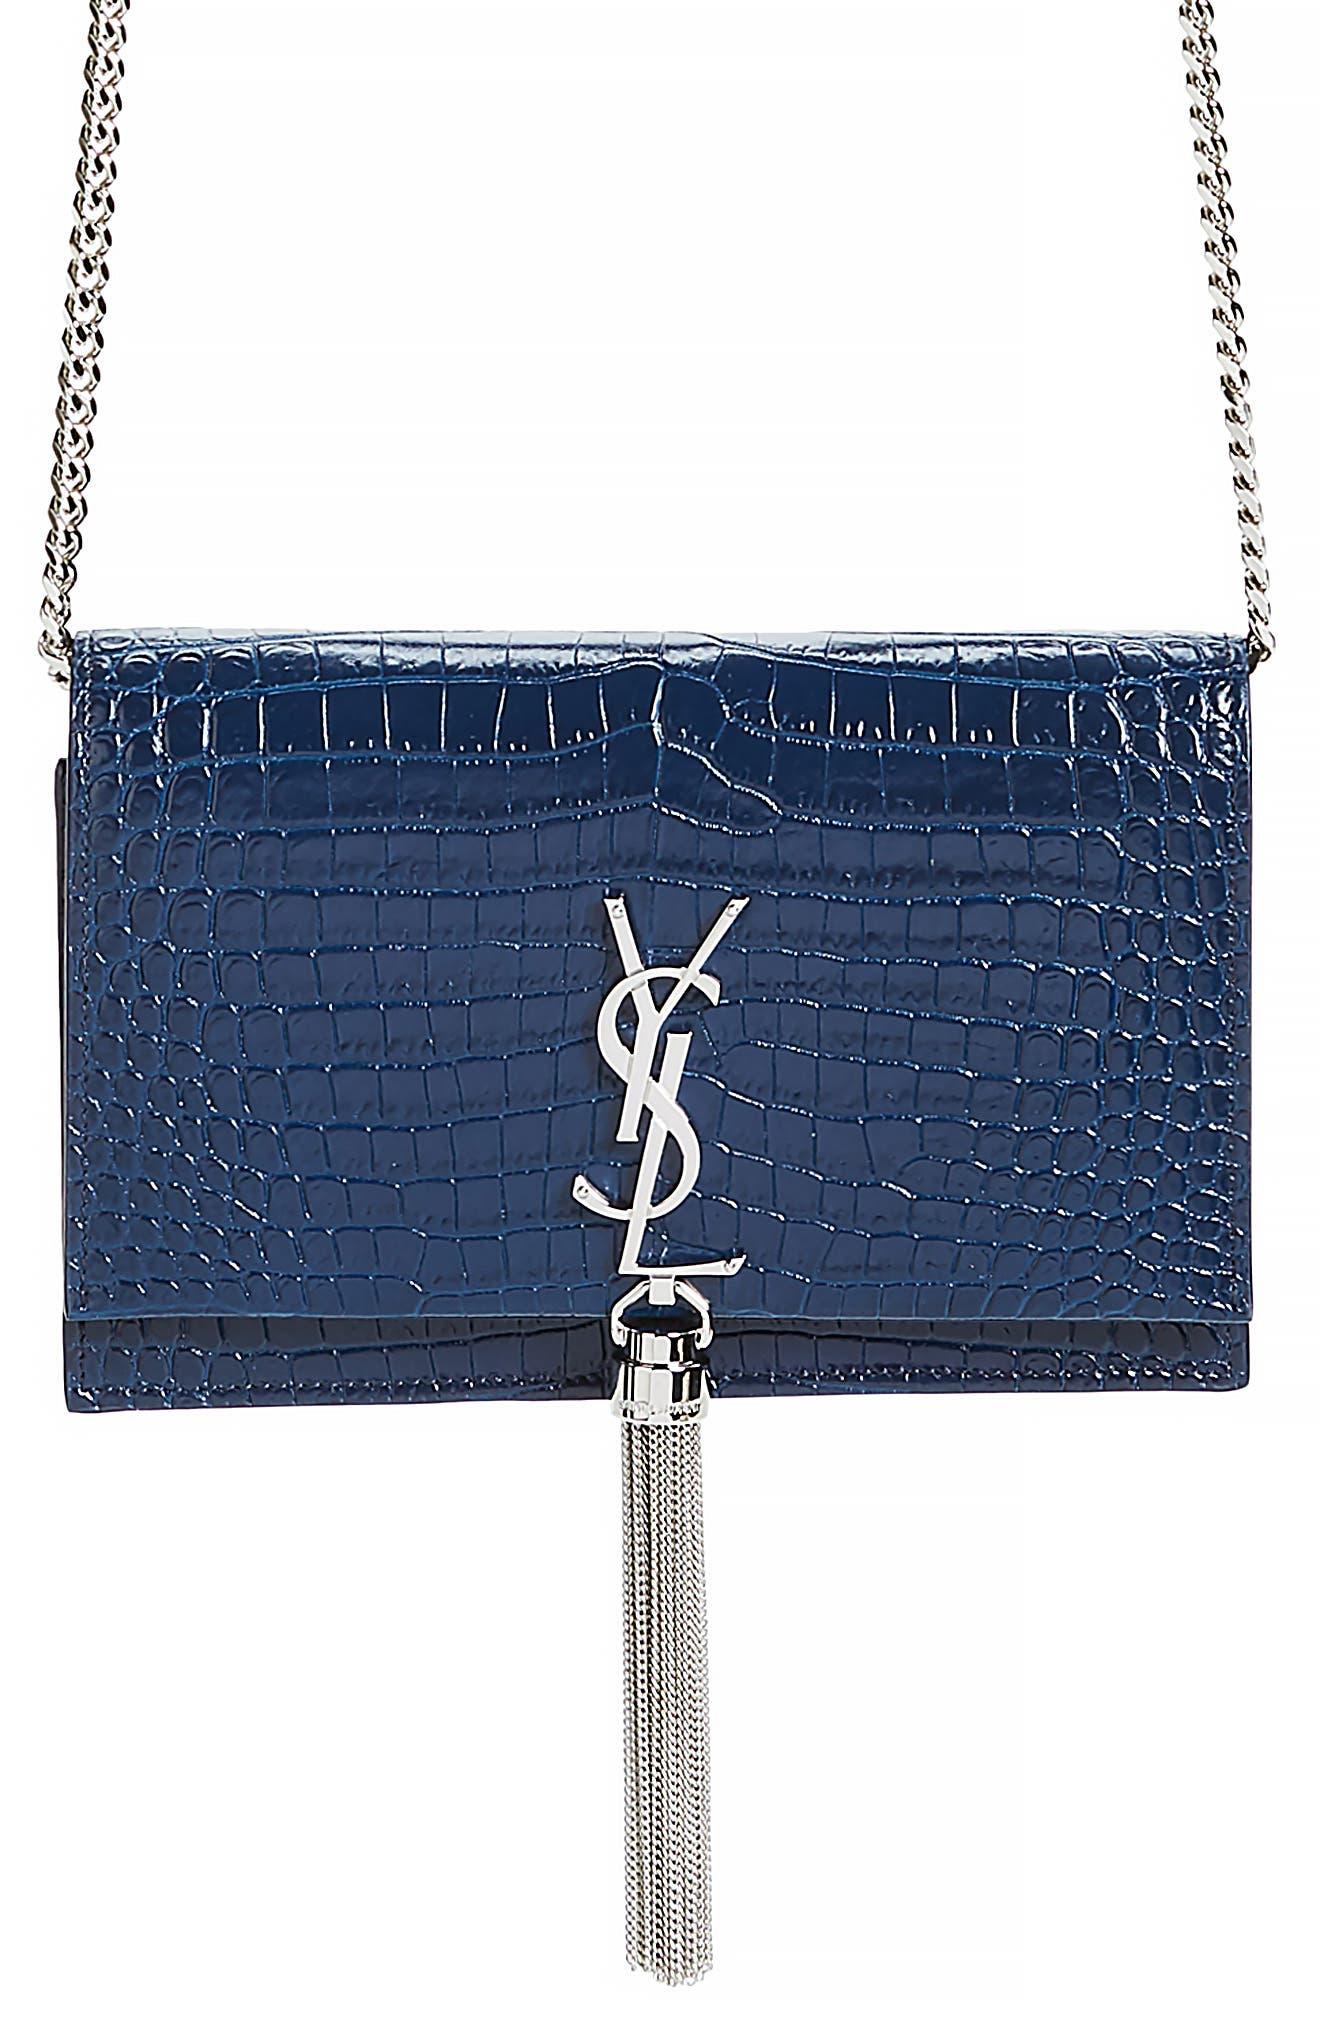 Kate Croc Embossed Leather Wallet on a Chain,                             Main thumbnail 1, color,                             DENIM BLUE/ DENIM BLUE